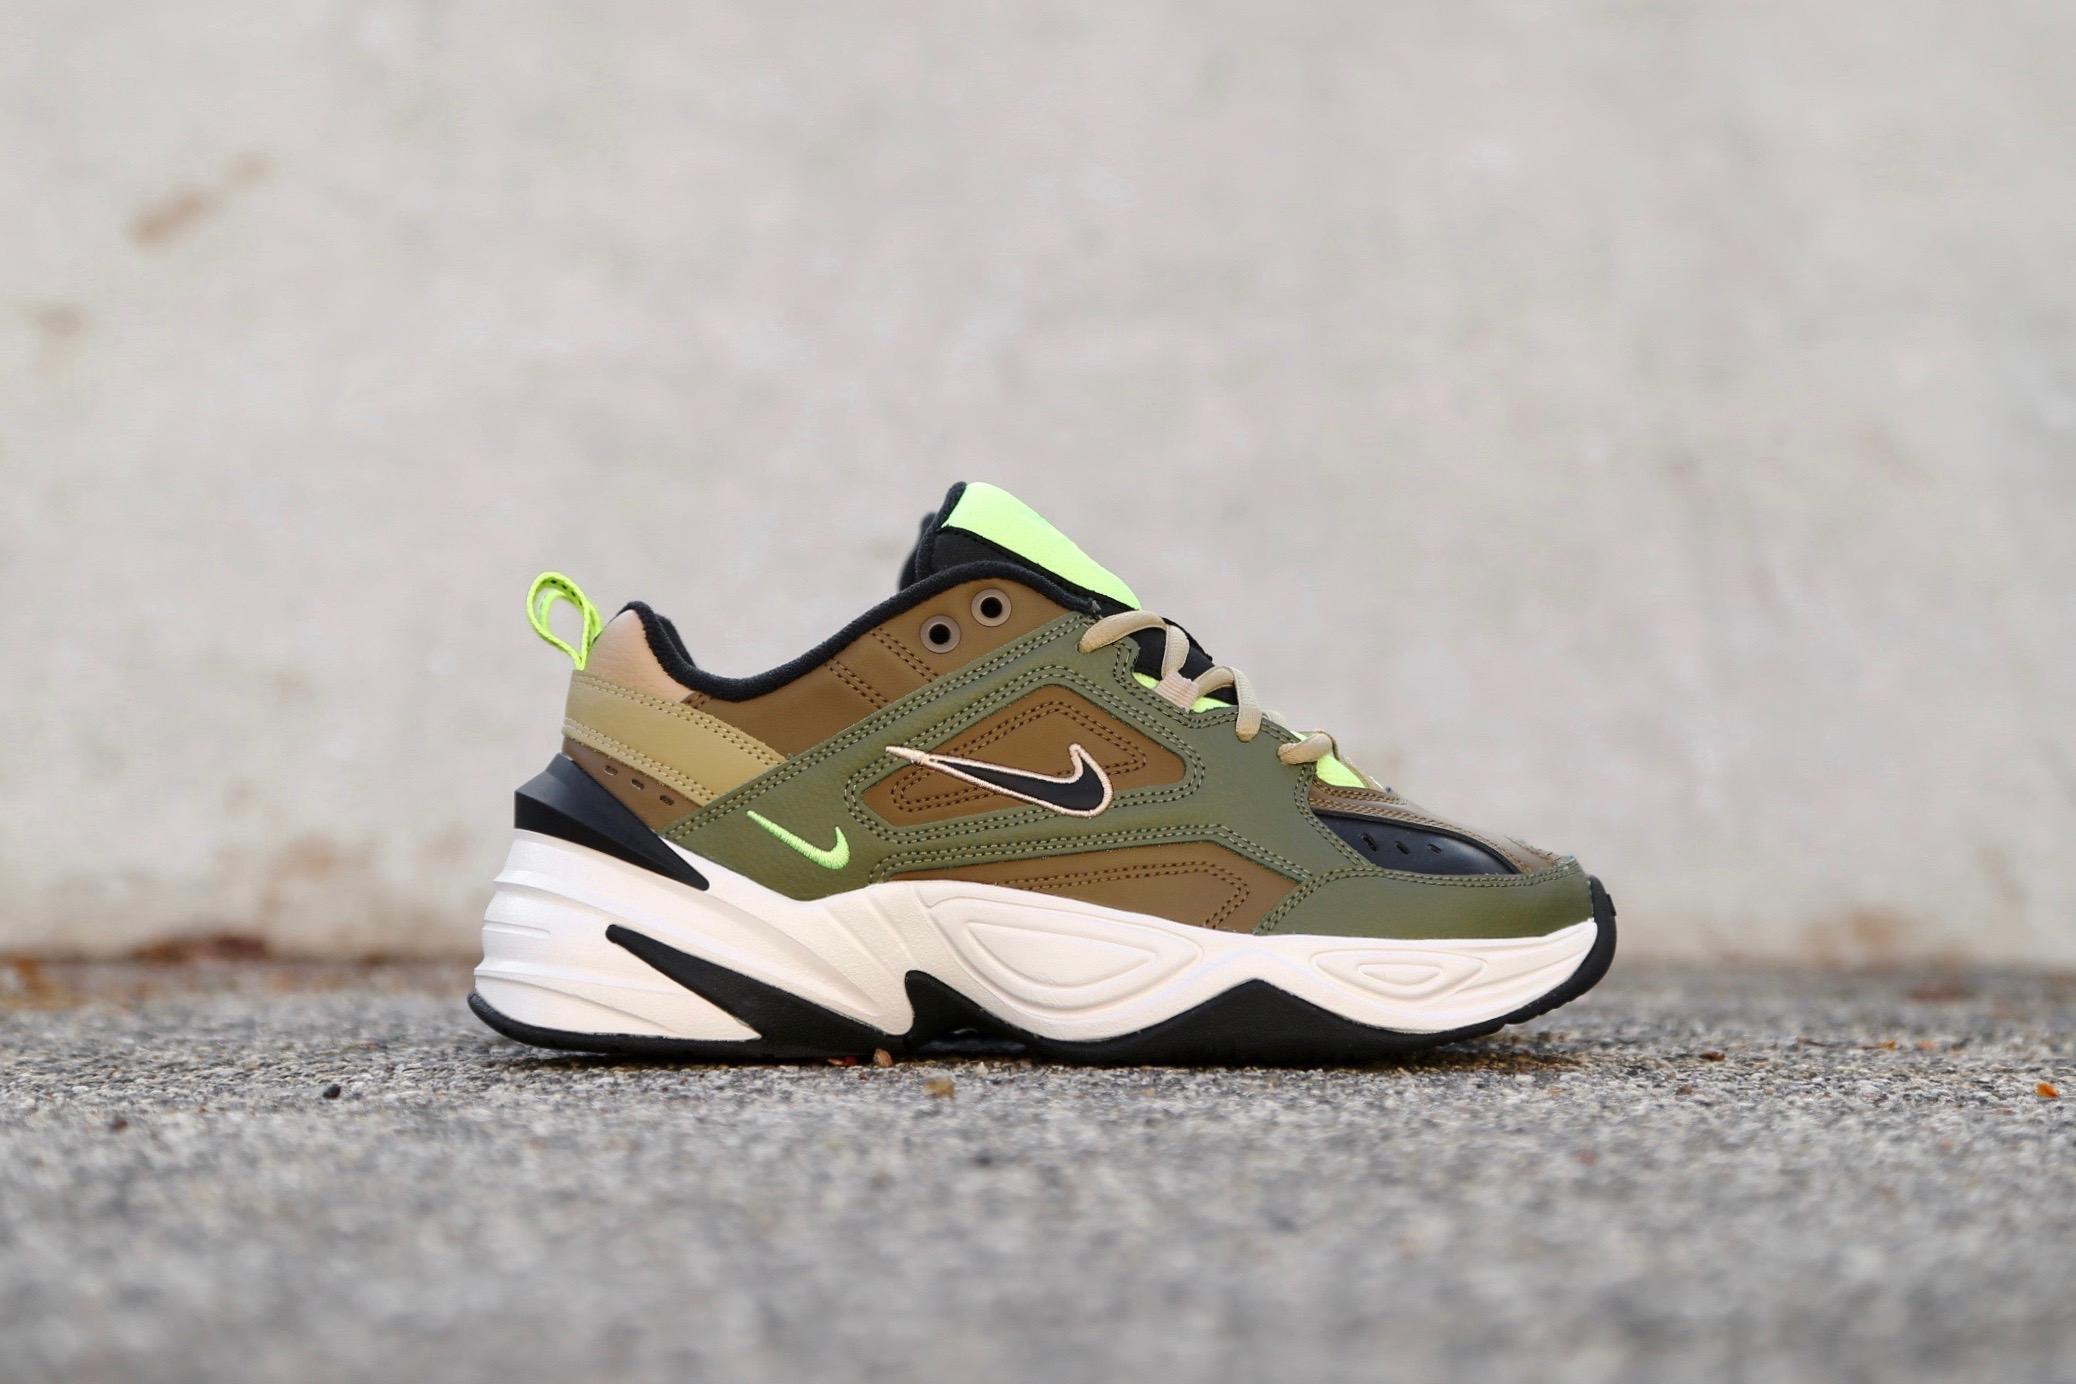 dcfc7cc2a0 Nike W M2K Tekno – Medium Olive / Yukon Brown / Parachute Beige ...